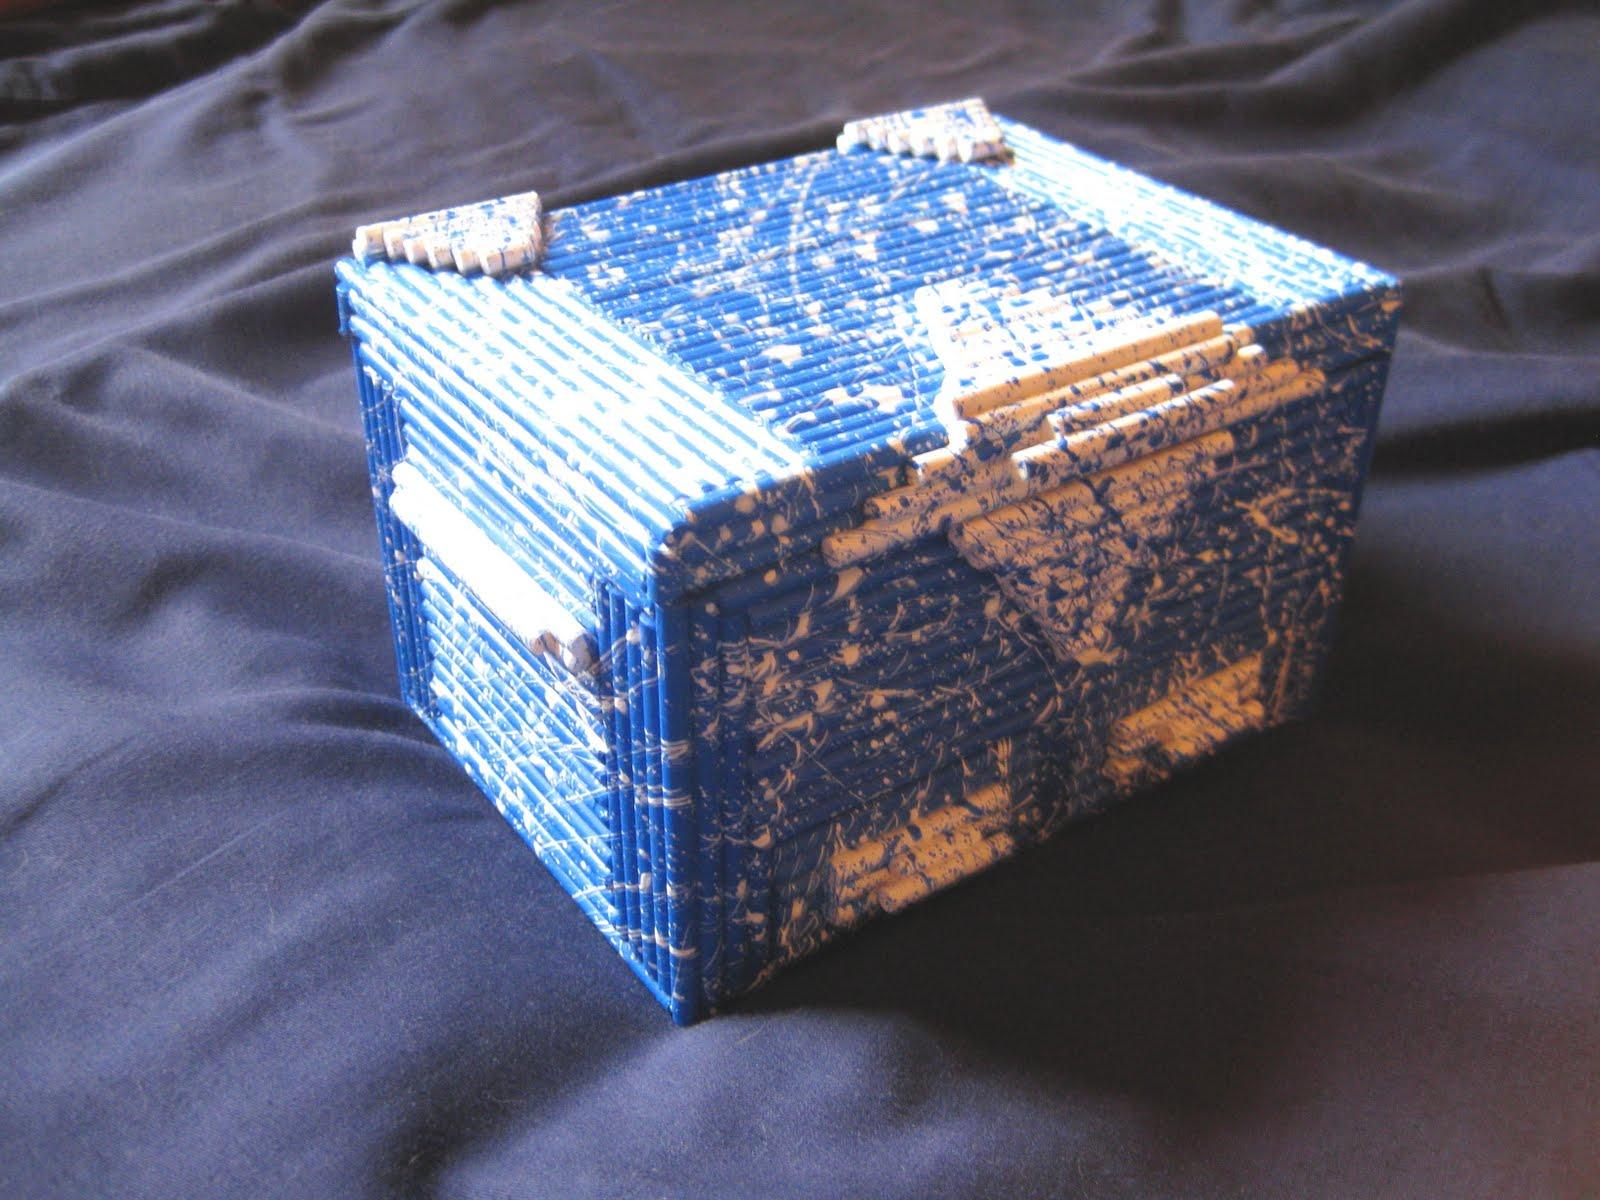 http://1.bp.blogspot.com/-O0YRcozFlb8/Tc_GHyH8GxI/AAAAAAAAAHo/3dbe8grr4LE/s1600/Hobby%2Bcraft%2Bjewelry%2Bbox%2Bfront.jpg